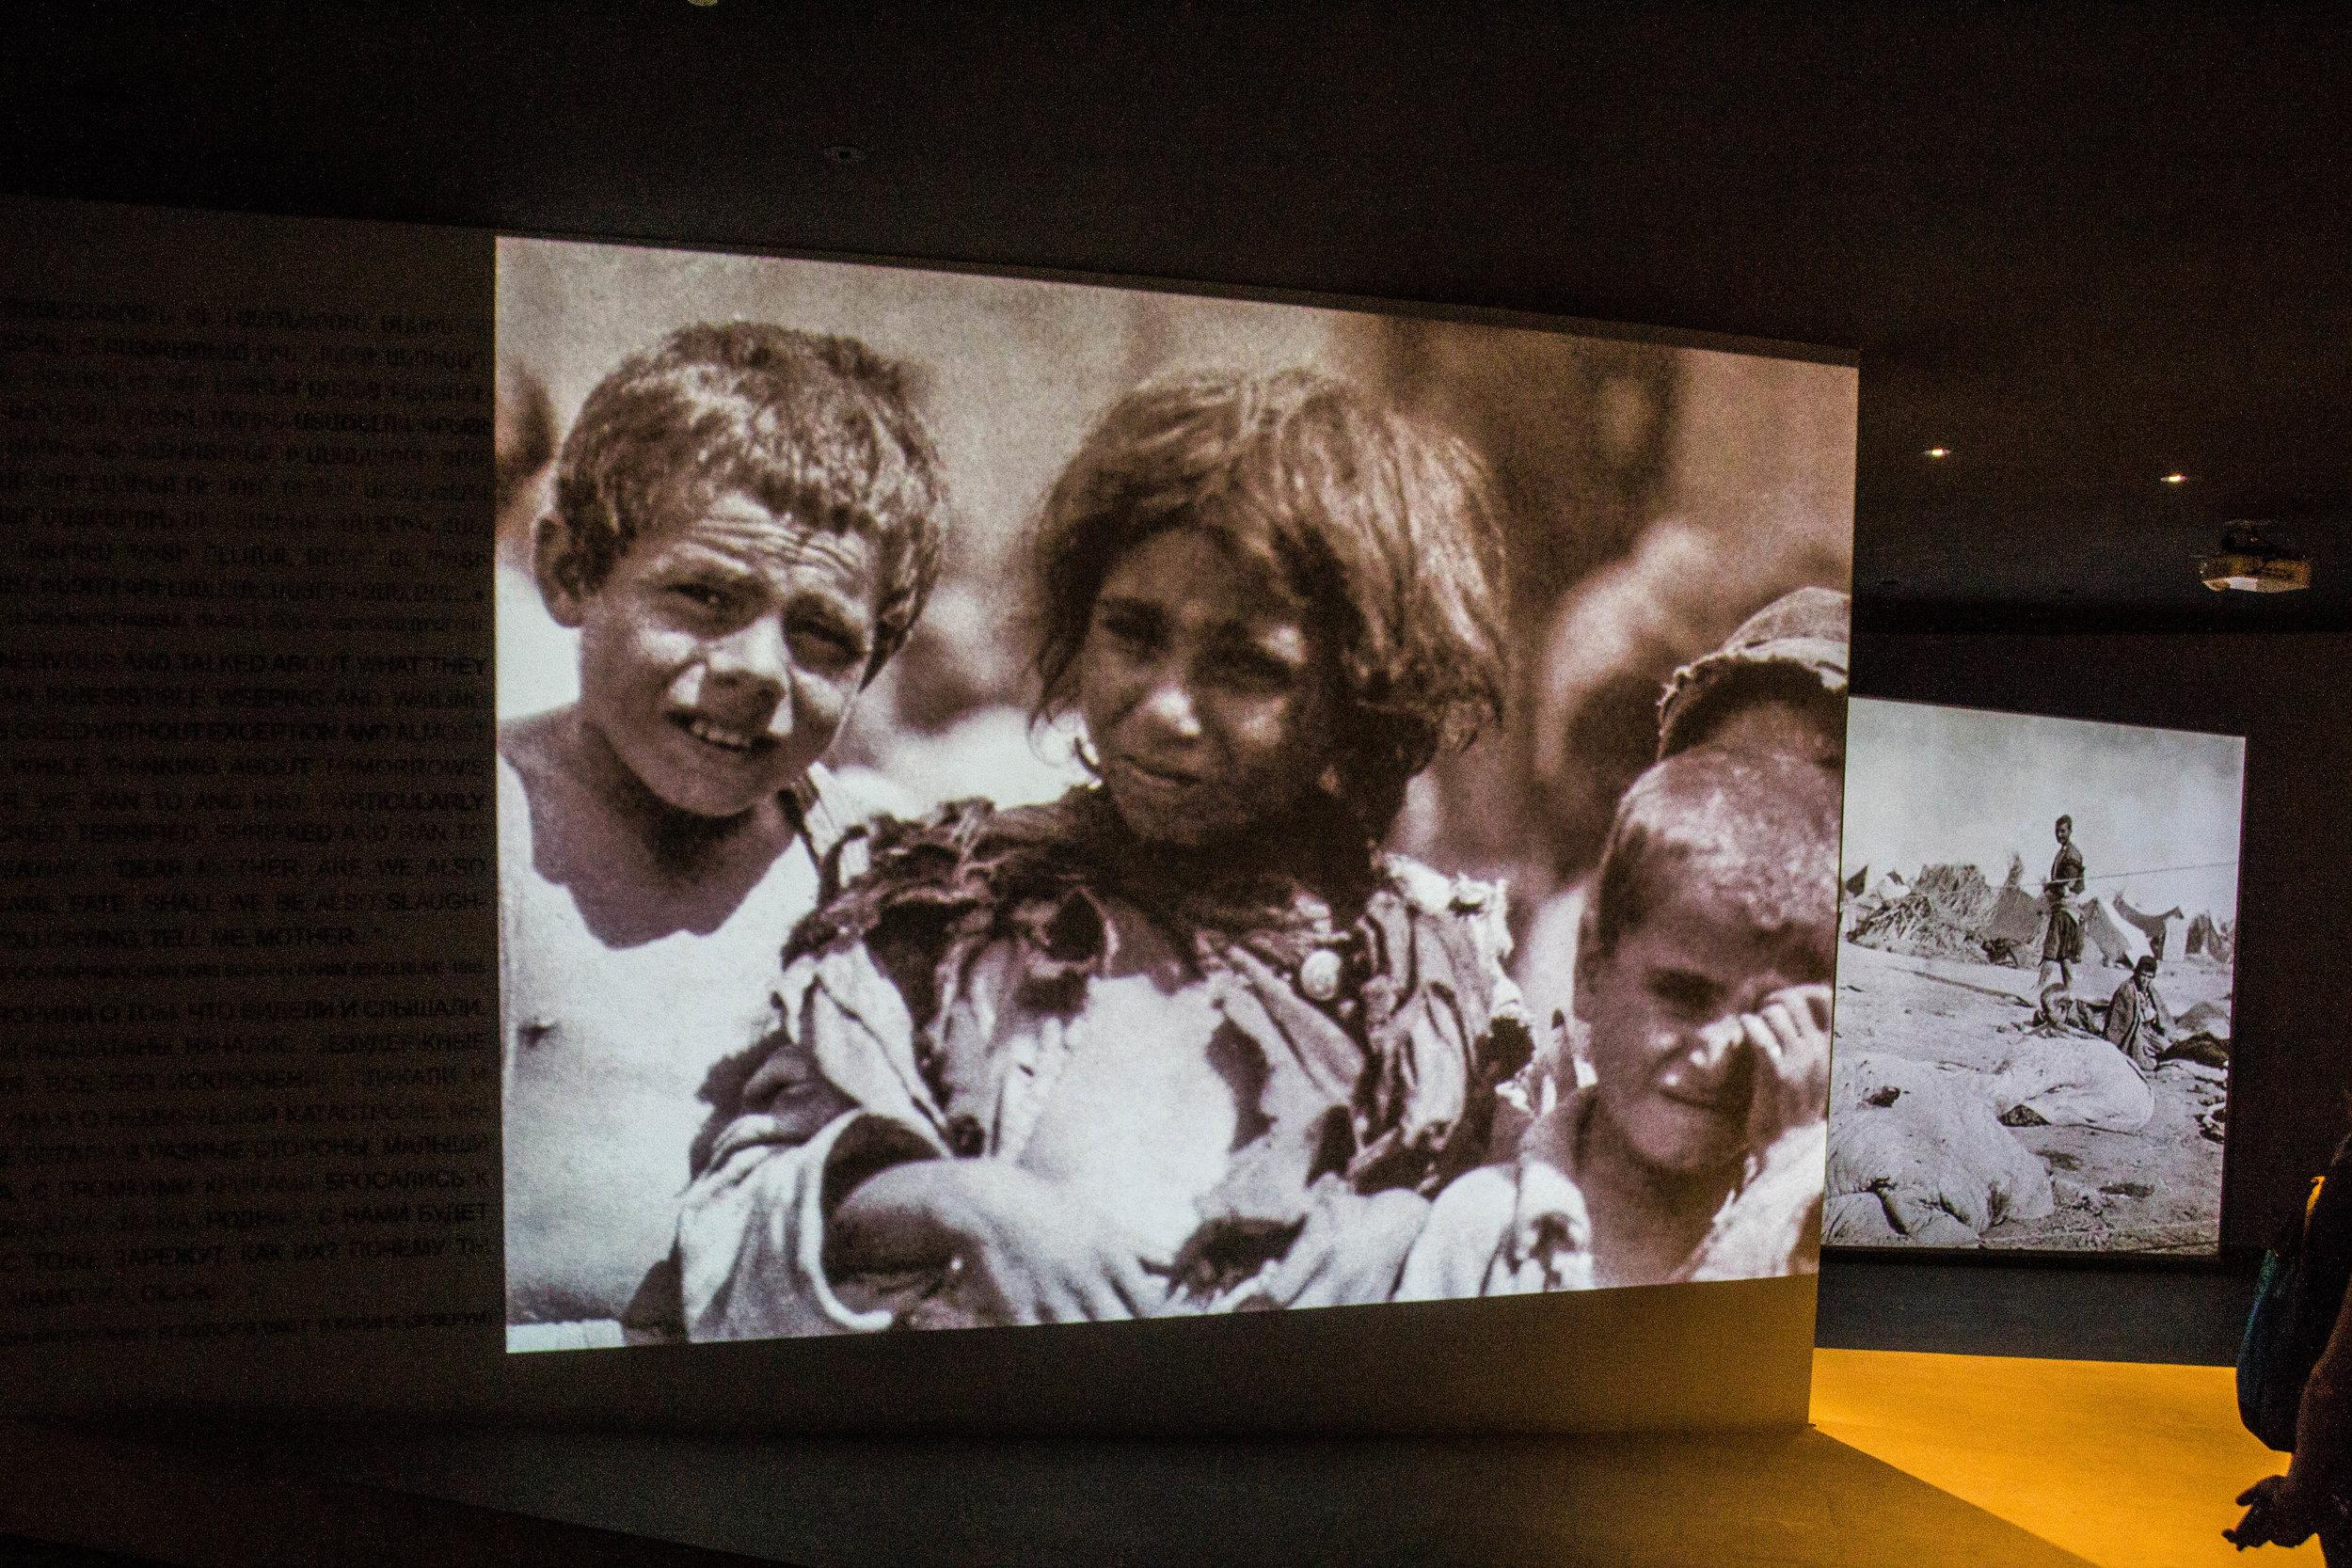 tsitsernakaberd-armenian-genocide-memorial-14.jpg